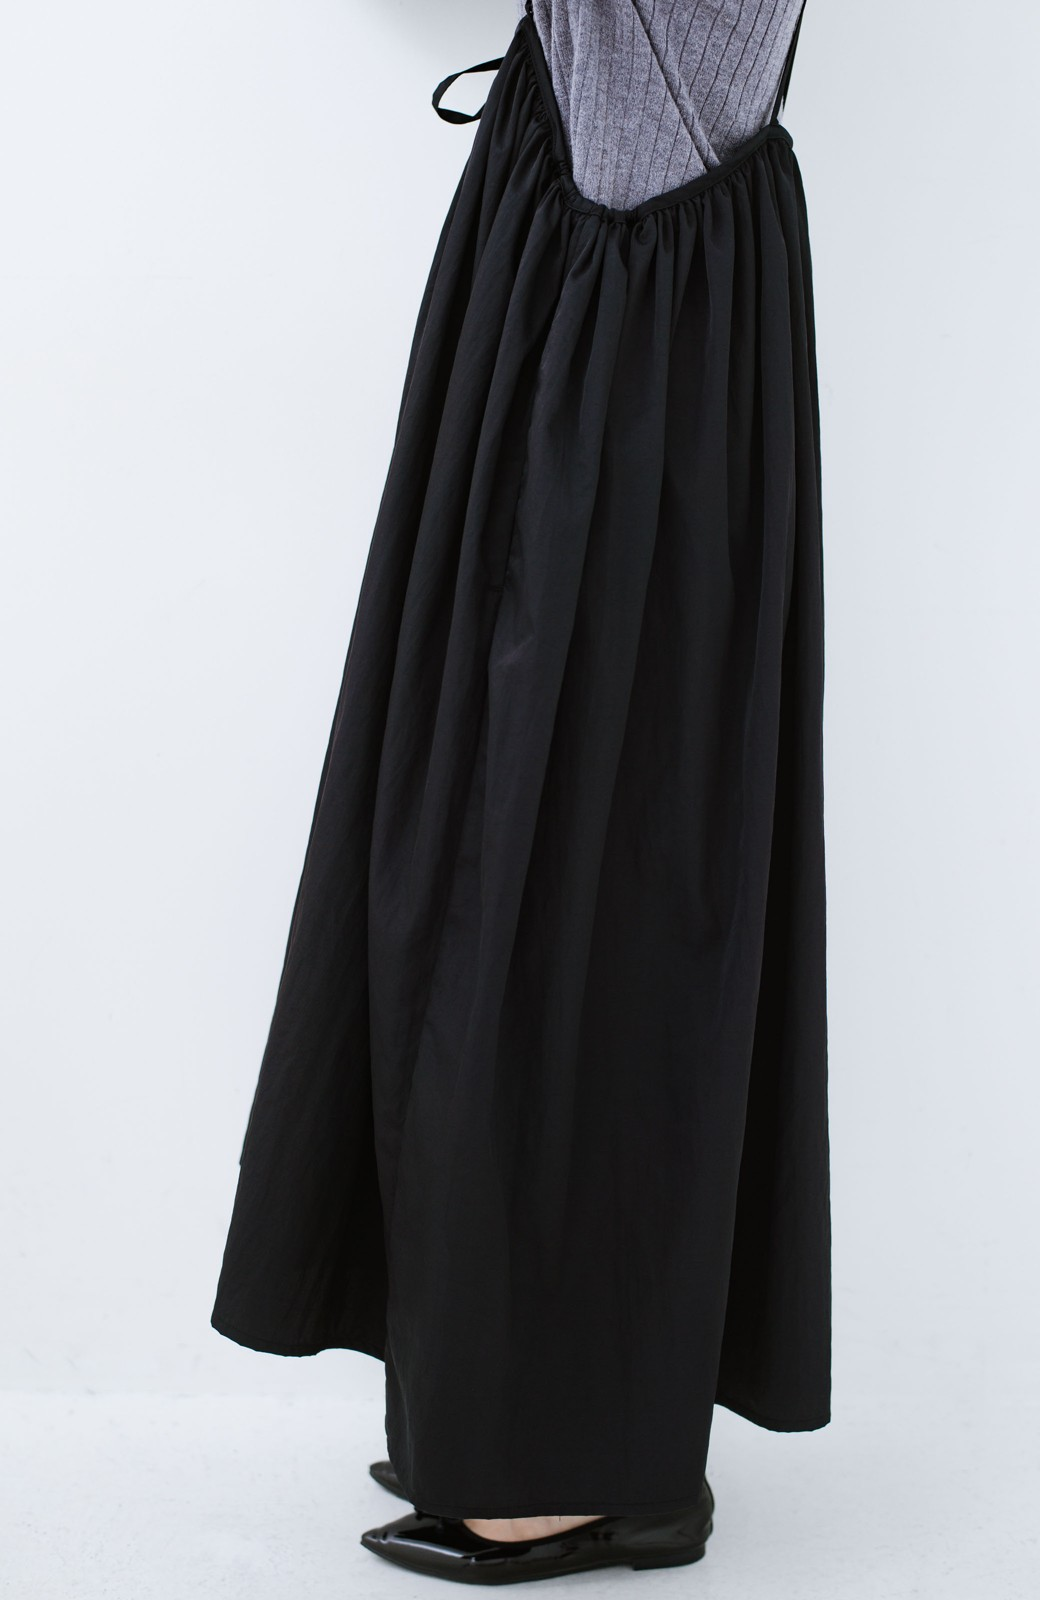 haco! 女の子バンザイ!プロジェクト【ブルー期】 ニットですら重ね着できる安心さ ゆったりギャザーキャミワンピ <ブラック>の商品写真14